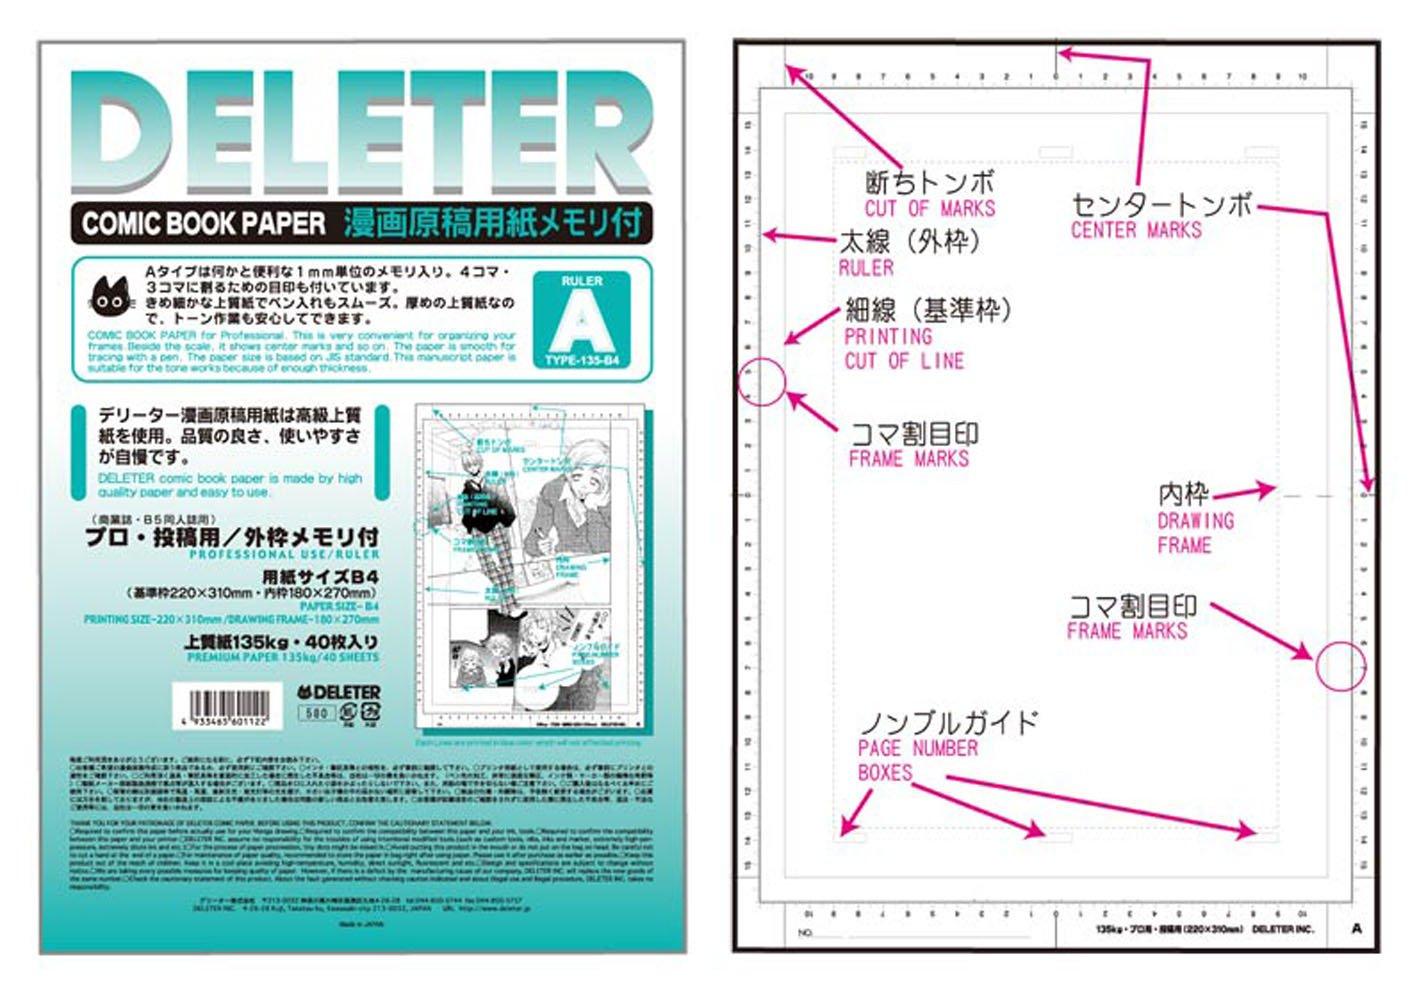 Deleter Comic Book Papel Tipo A B4/135kg Con Escala 40 Hoja